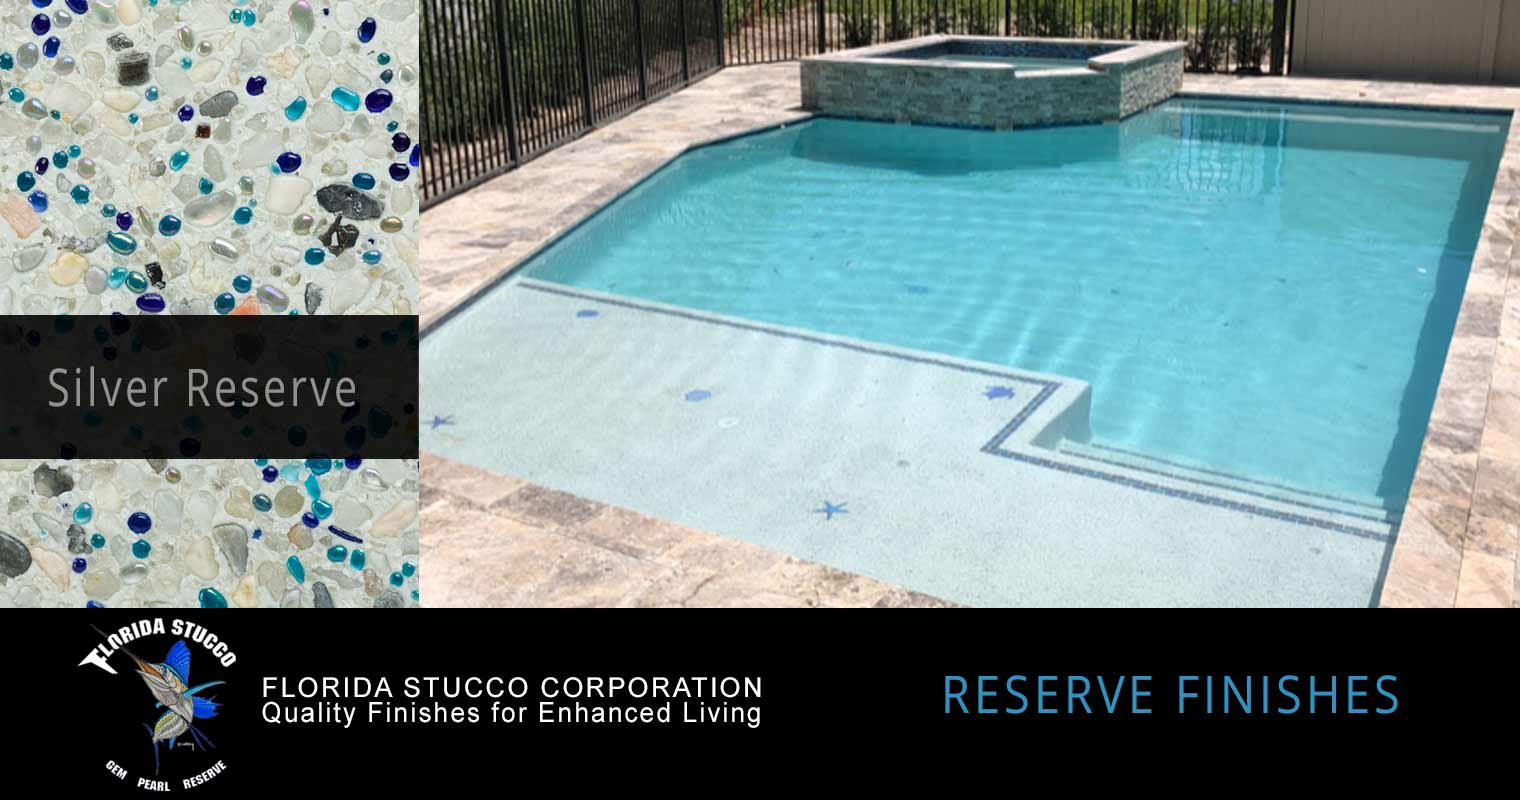 Florida Stucco - Florida Reserve Gem and Glass Plastering Finish Pool Sample 1